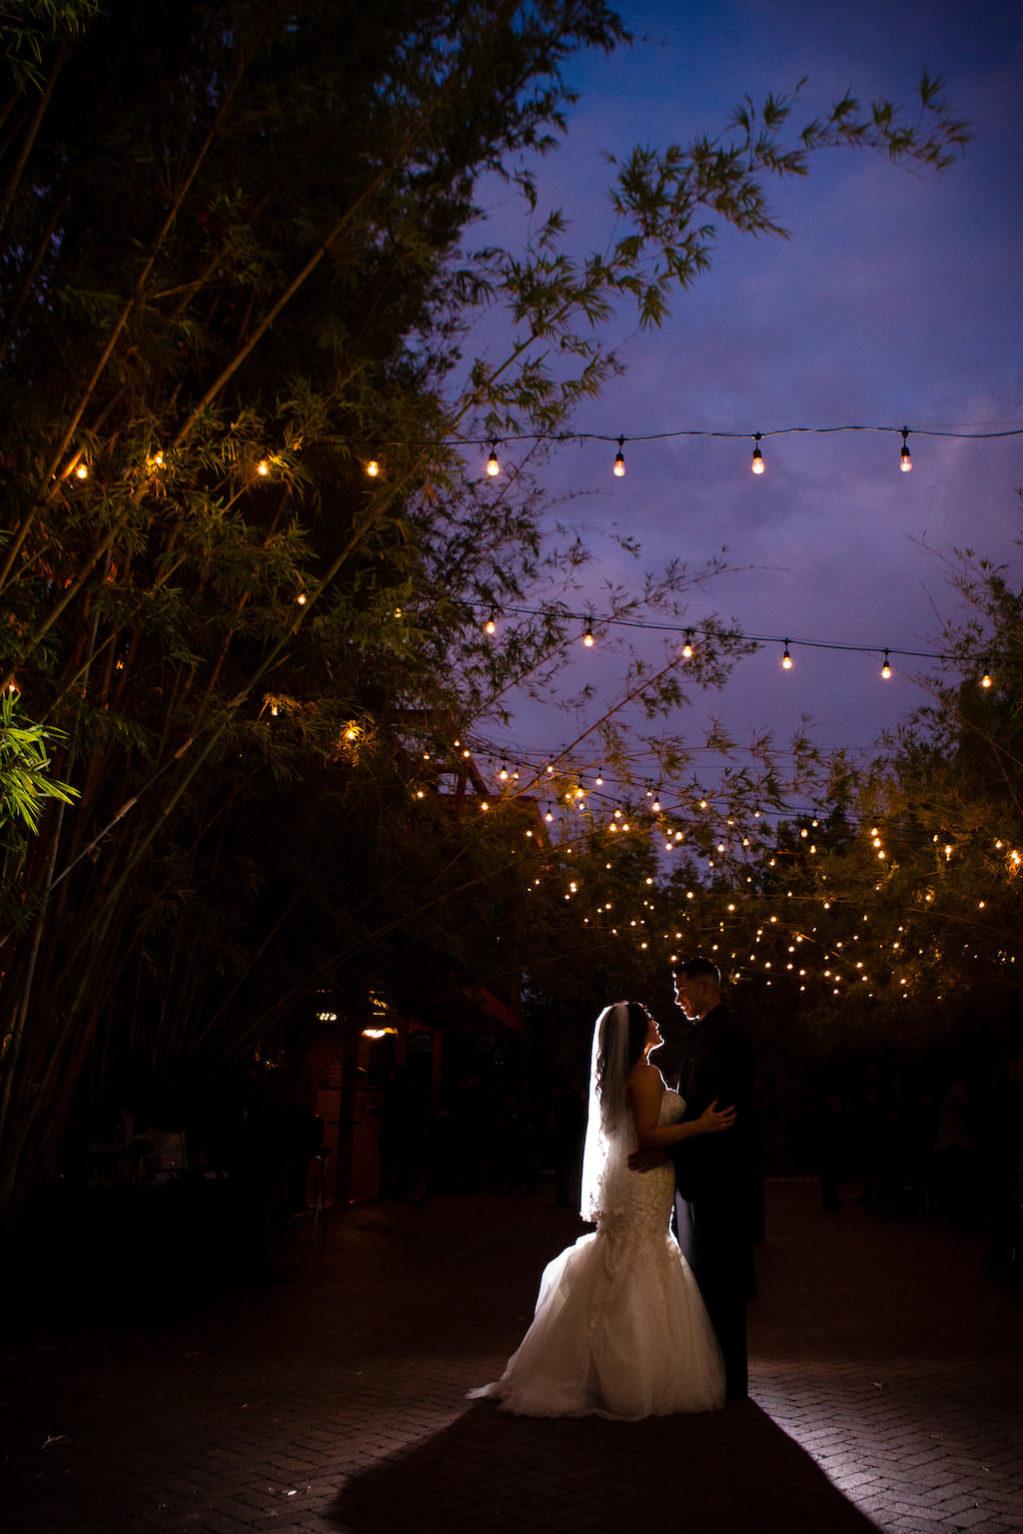 Nighttime, Twilight Bride and Groom Outdoor Wedding Portrait with Hanging Bistro Lights   Downtown St. Pete Wedding Venue NOVA 535